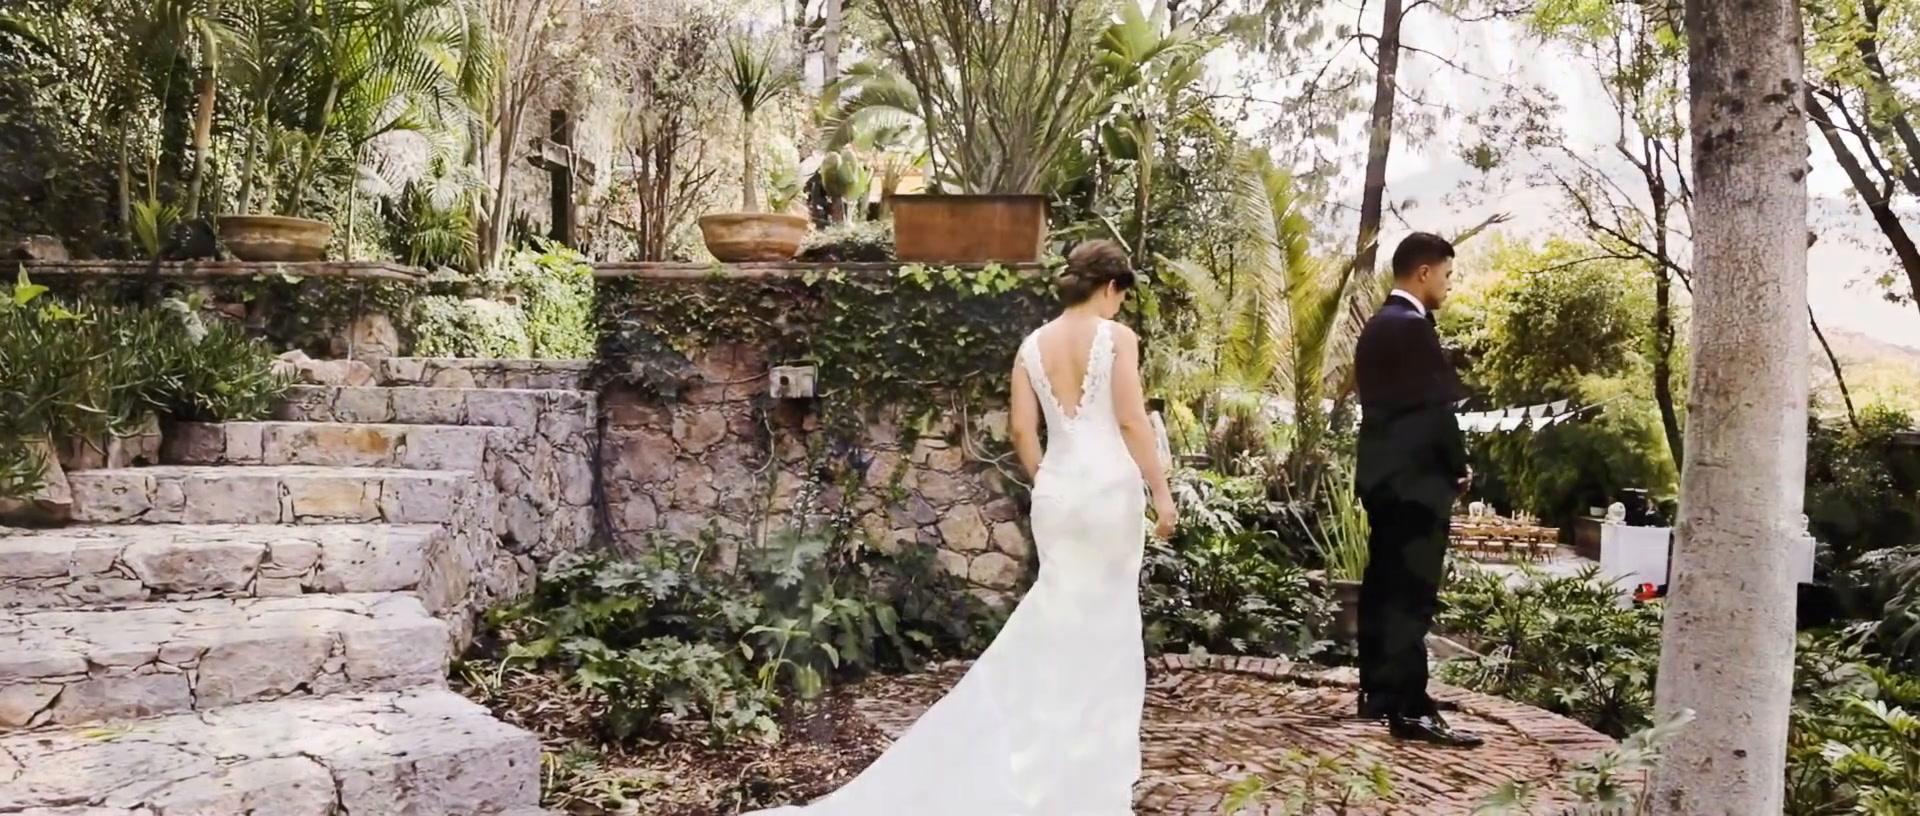 Michelle + Ricardo | San Miguel de Allende, Mexico | Casa Chorro